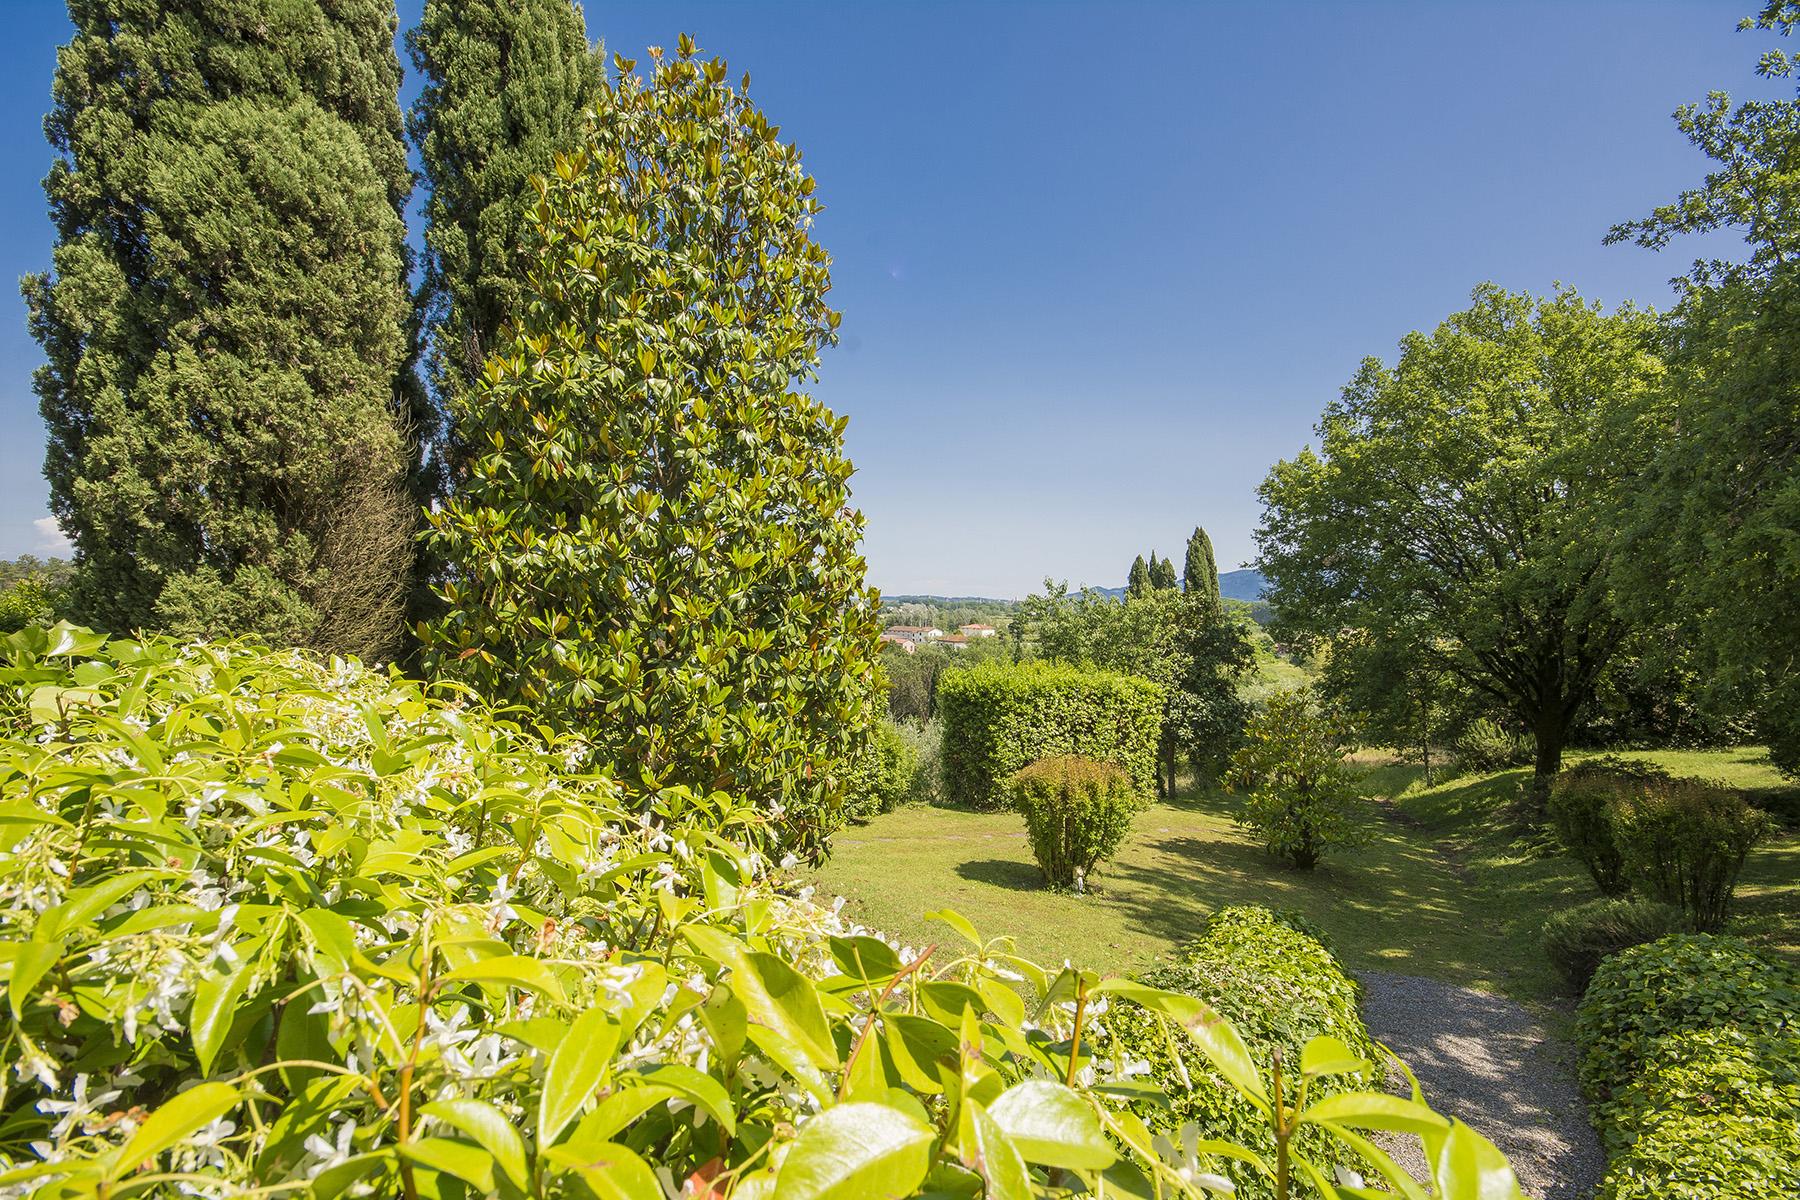 Villa in Vendita a Lucca: 5 locali, 600 mq - Foto 25